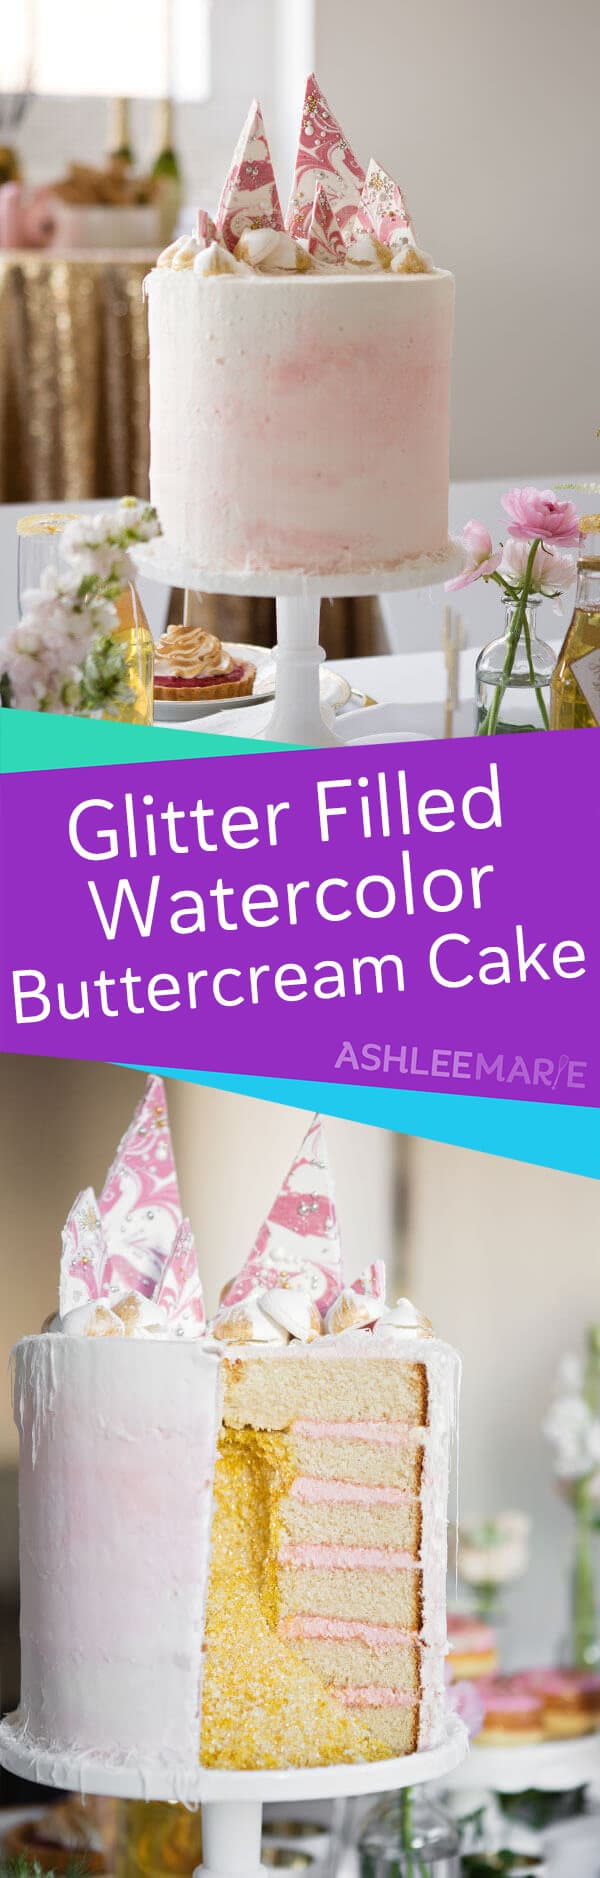 edible glitter filled cake video tutorial